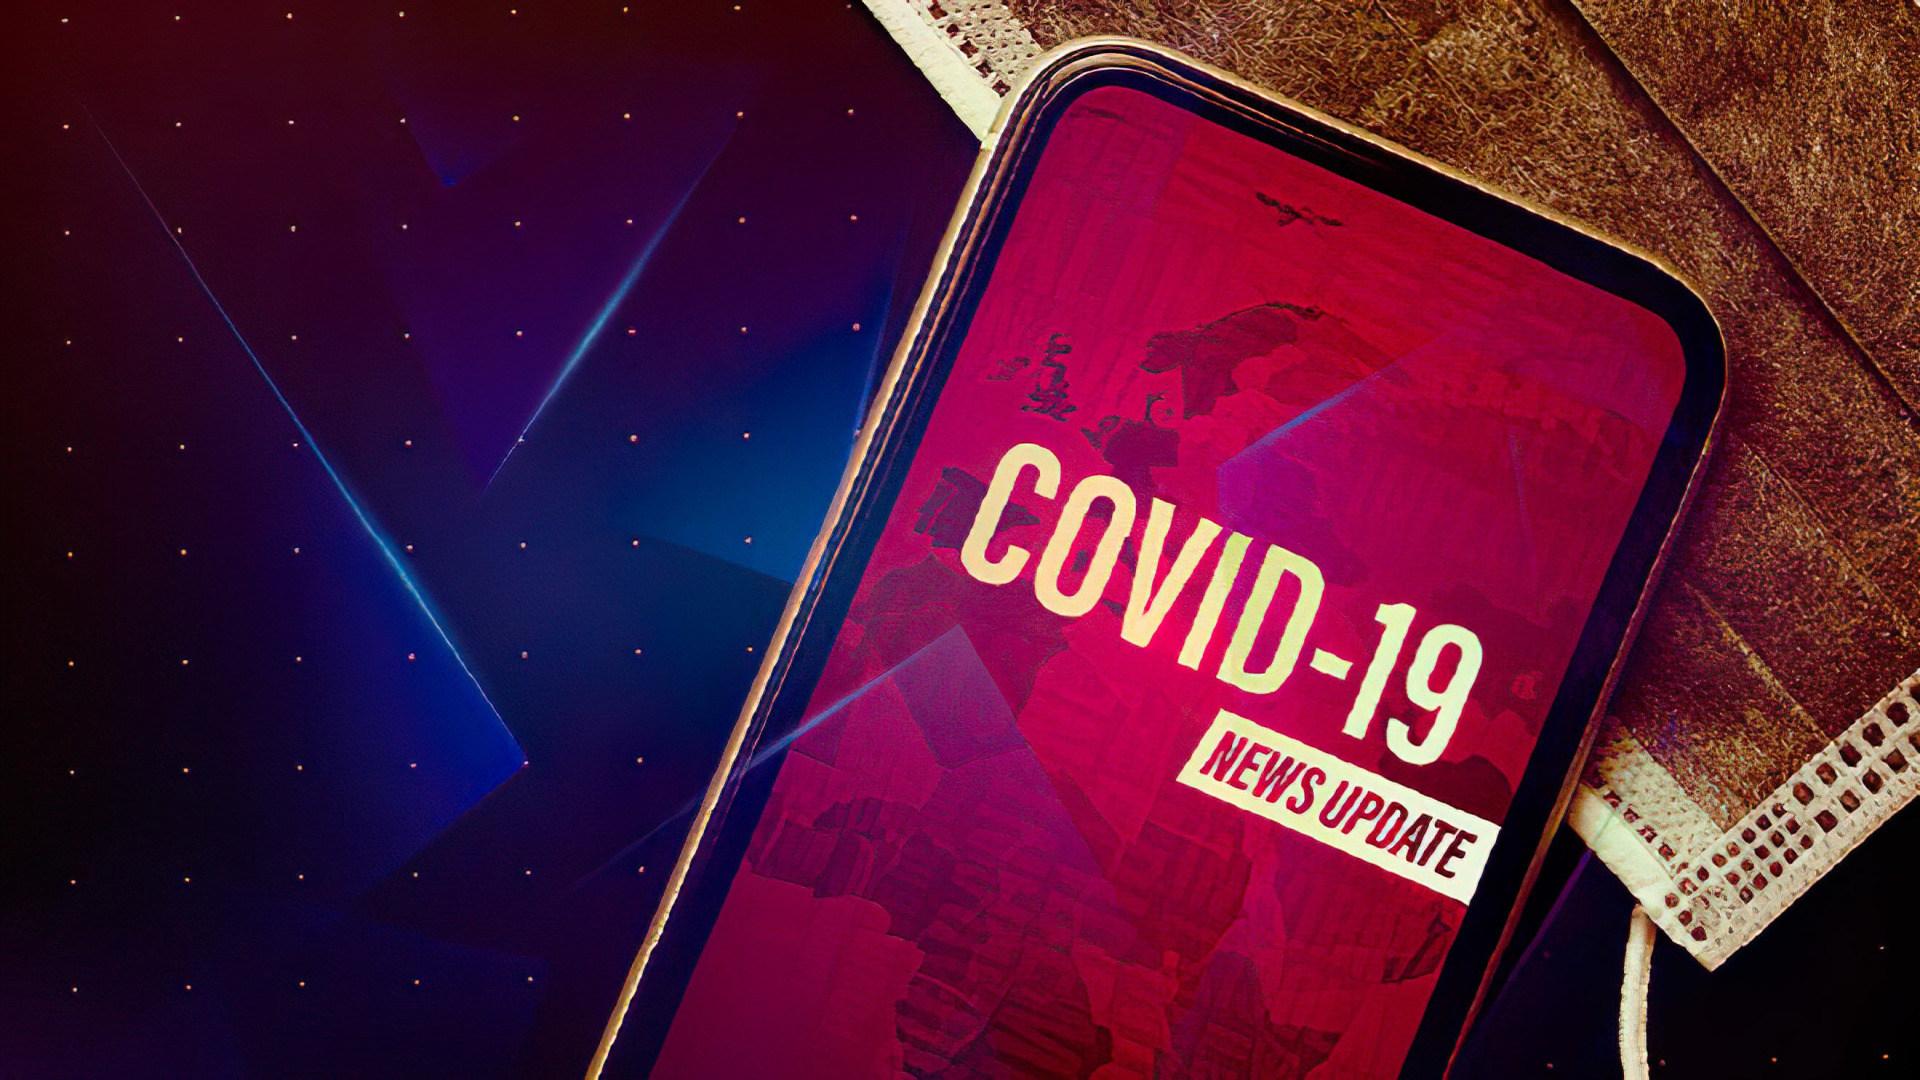 Coronavirus, Corona, Covid-19, Coronakrise, Corona-Virus, Covid-2019, Covid, Covid-19-Tracker, Covid19